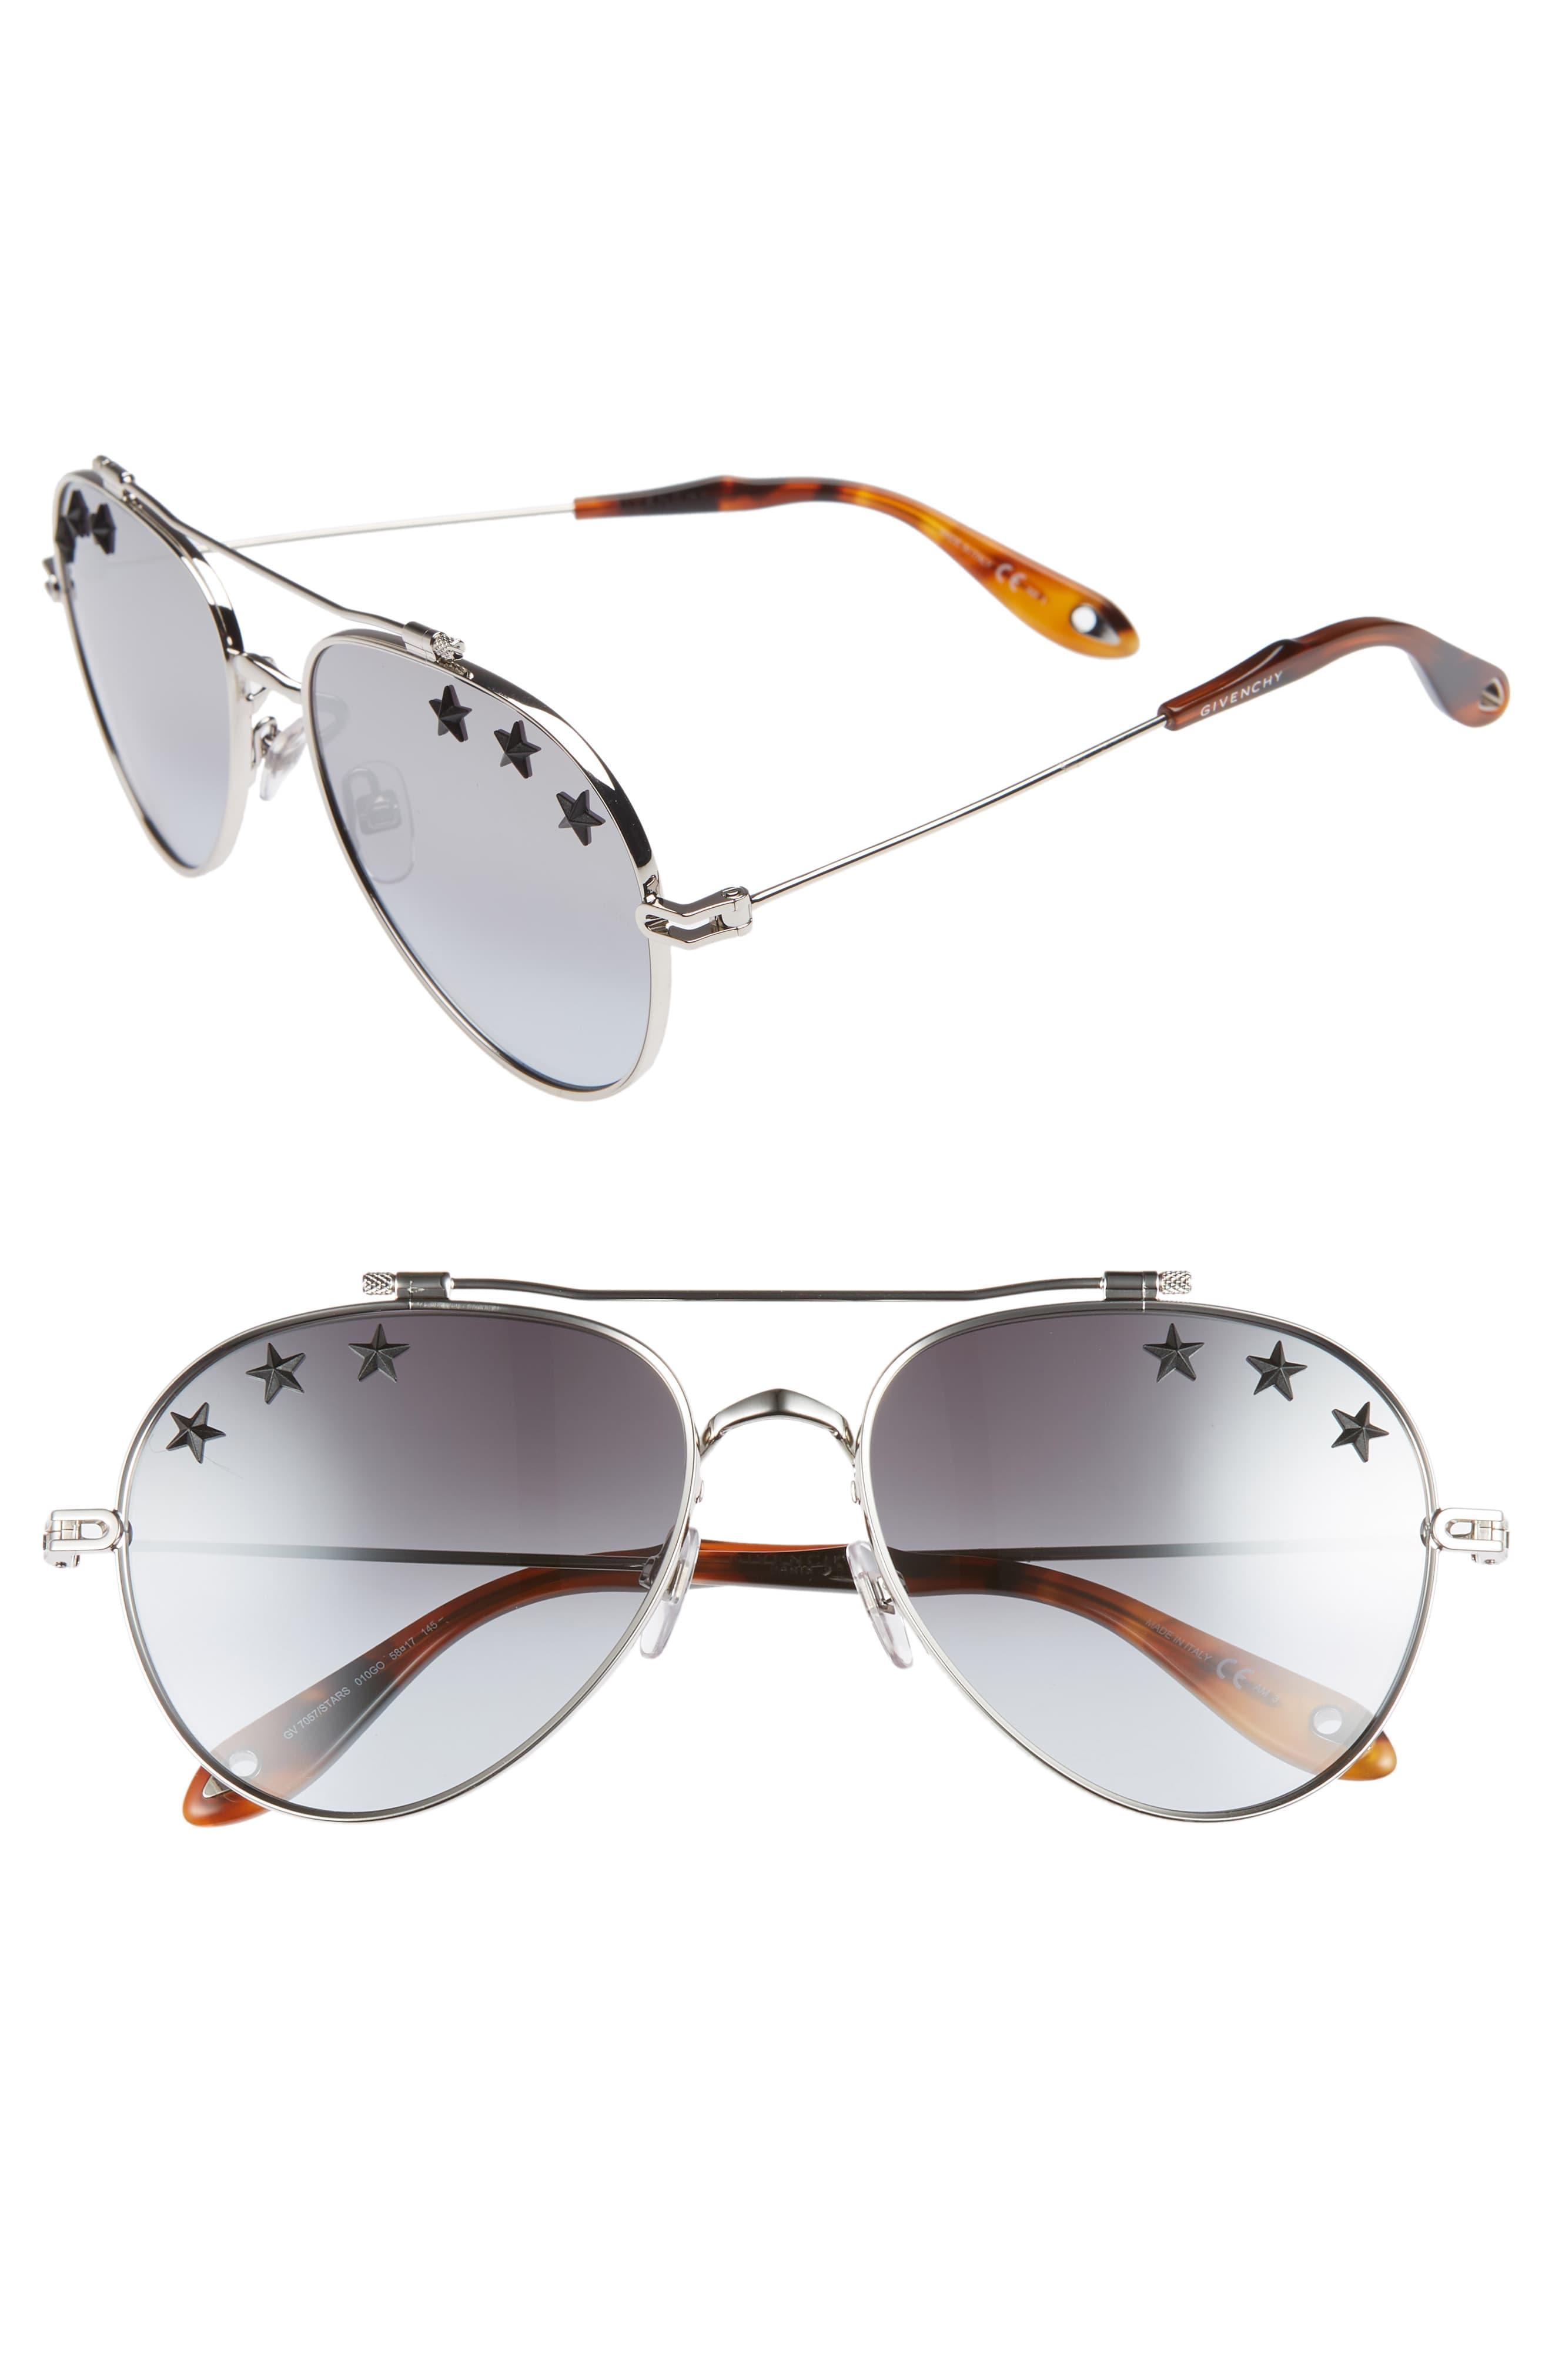 314024f9a08f9 Givenchy - Gray Star Detail 58mm Mirrored Aviator Sunglasses - Palladium   Grey Azure - Lyst. View fullscreen